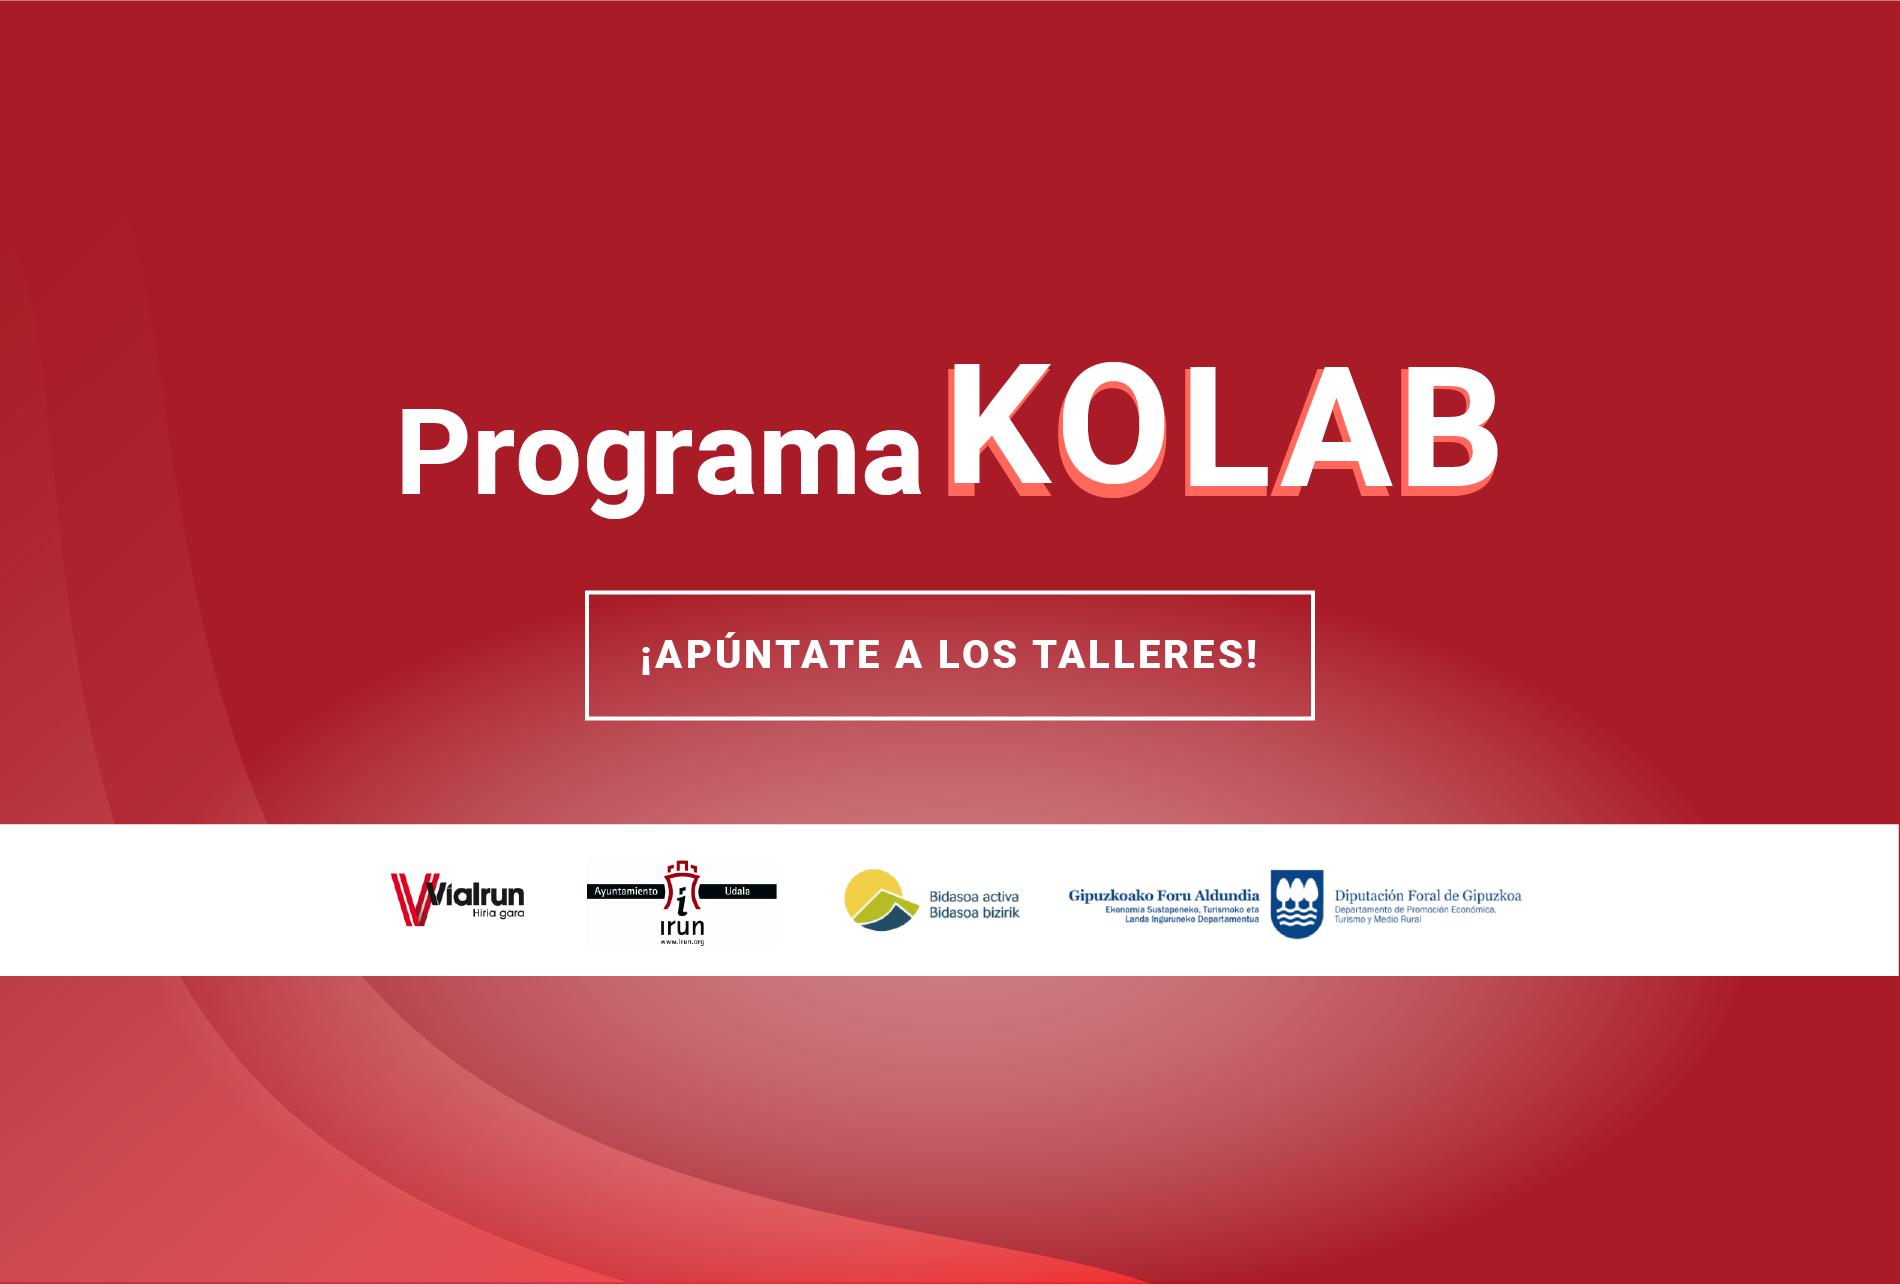 Programa Kolab